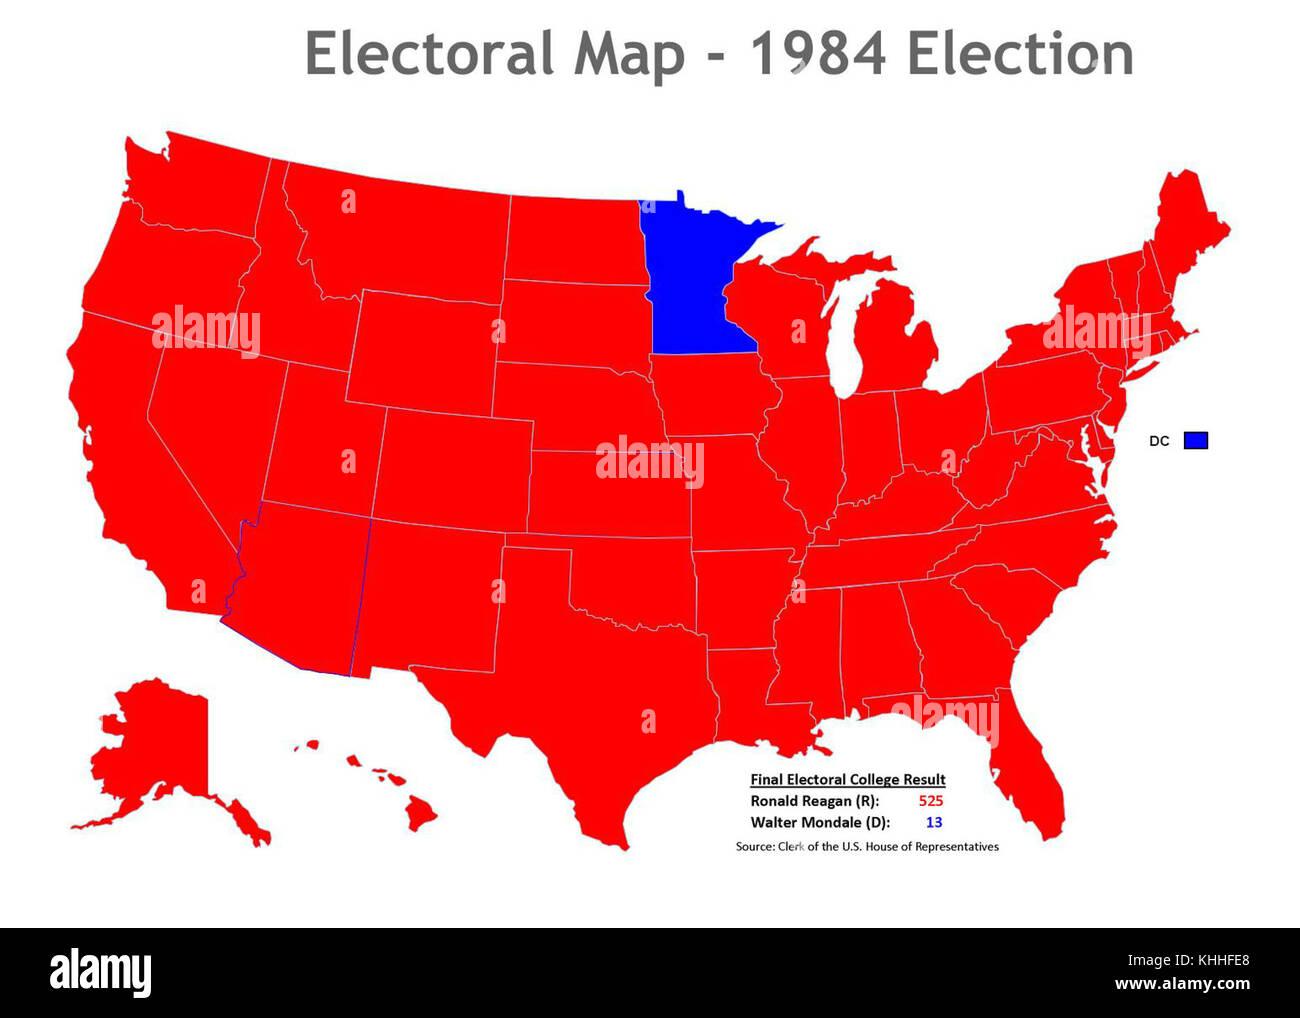 1984 election map (30798498291 Stock Photo: 165727808 - Alamy